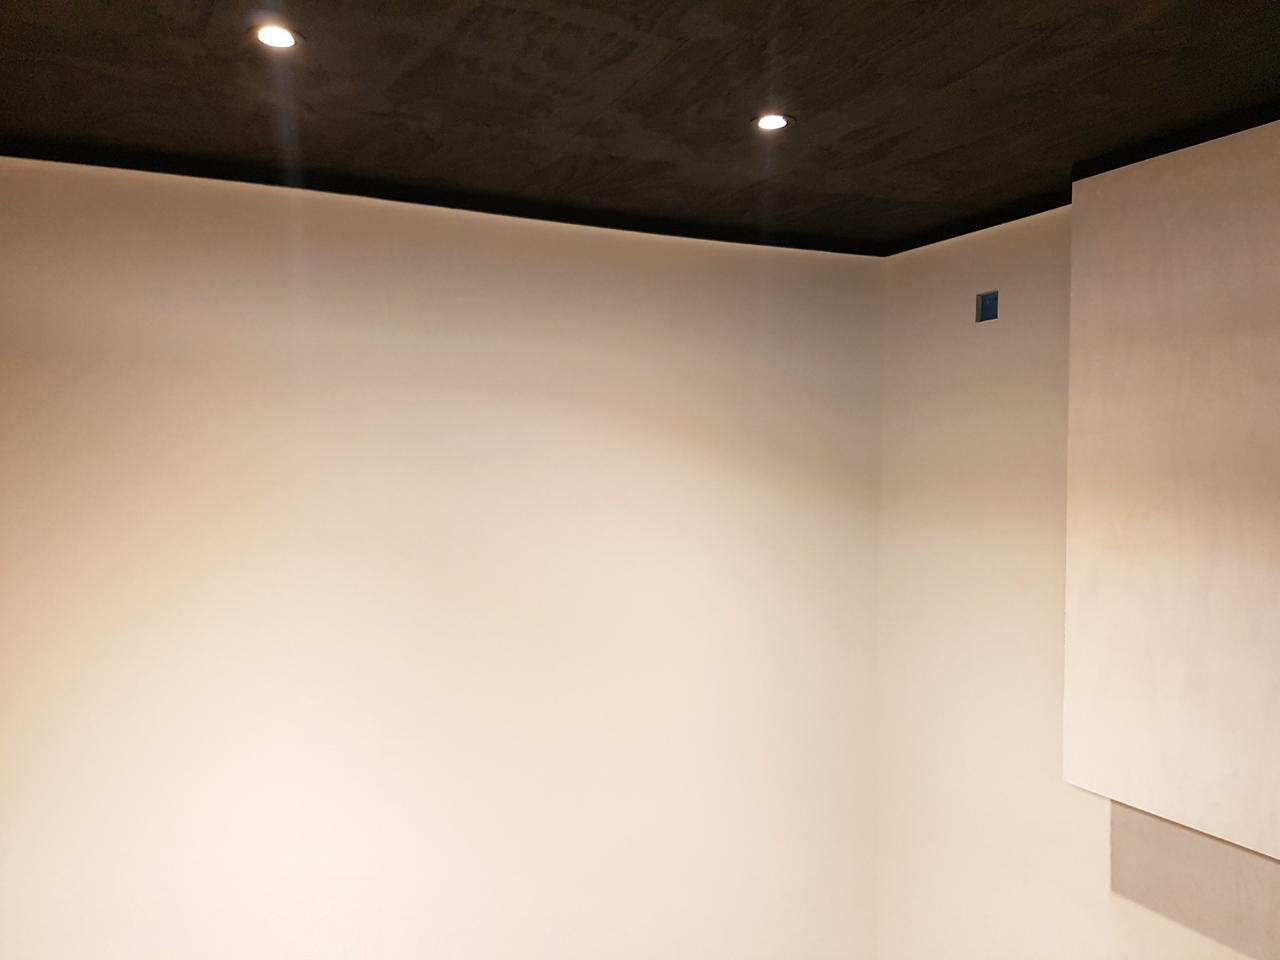 Garage_plinten_plafond1.jpg